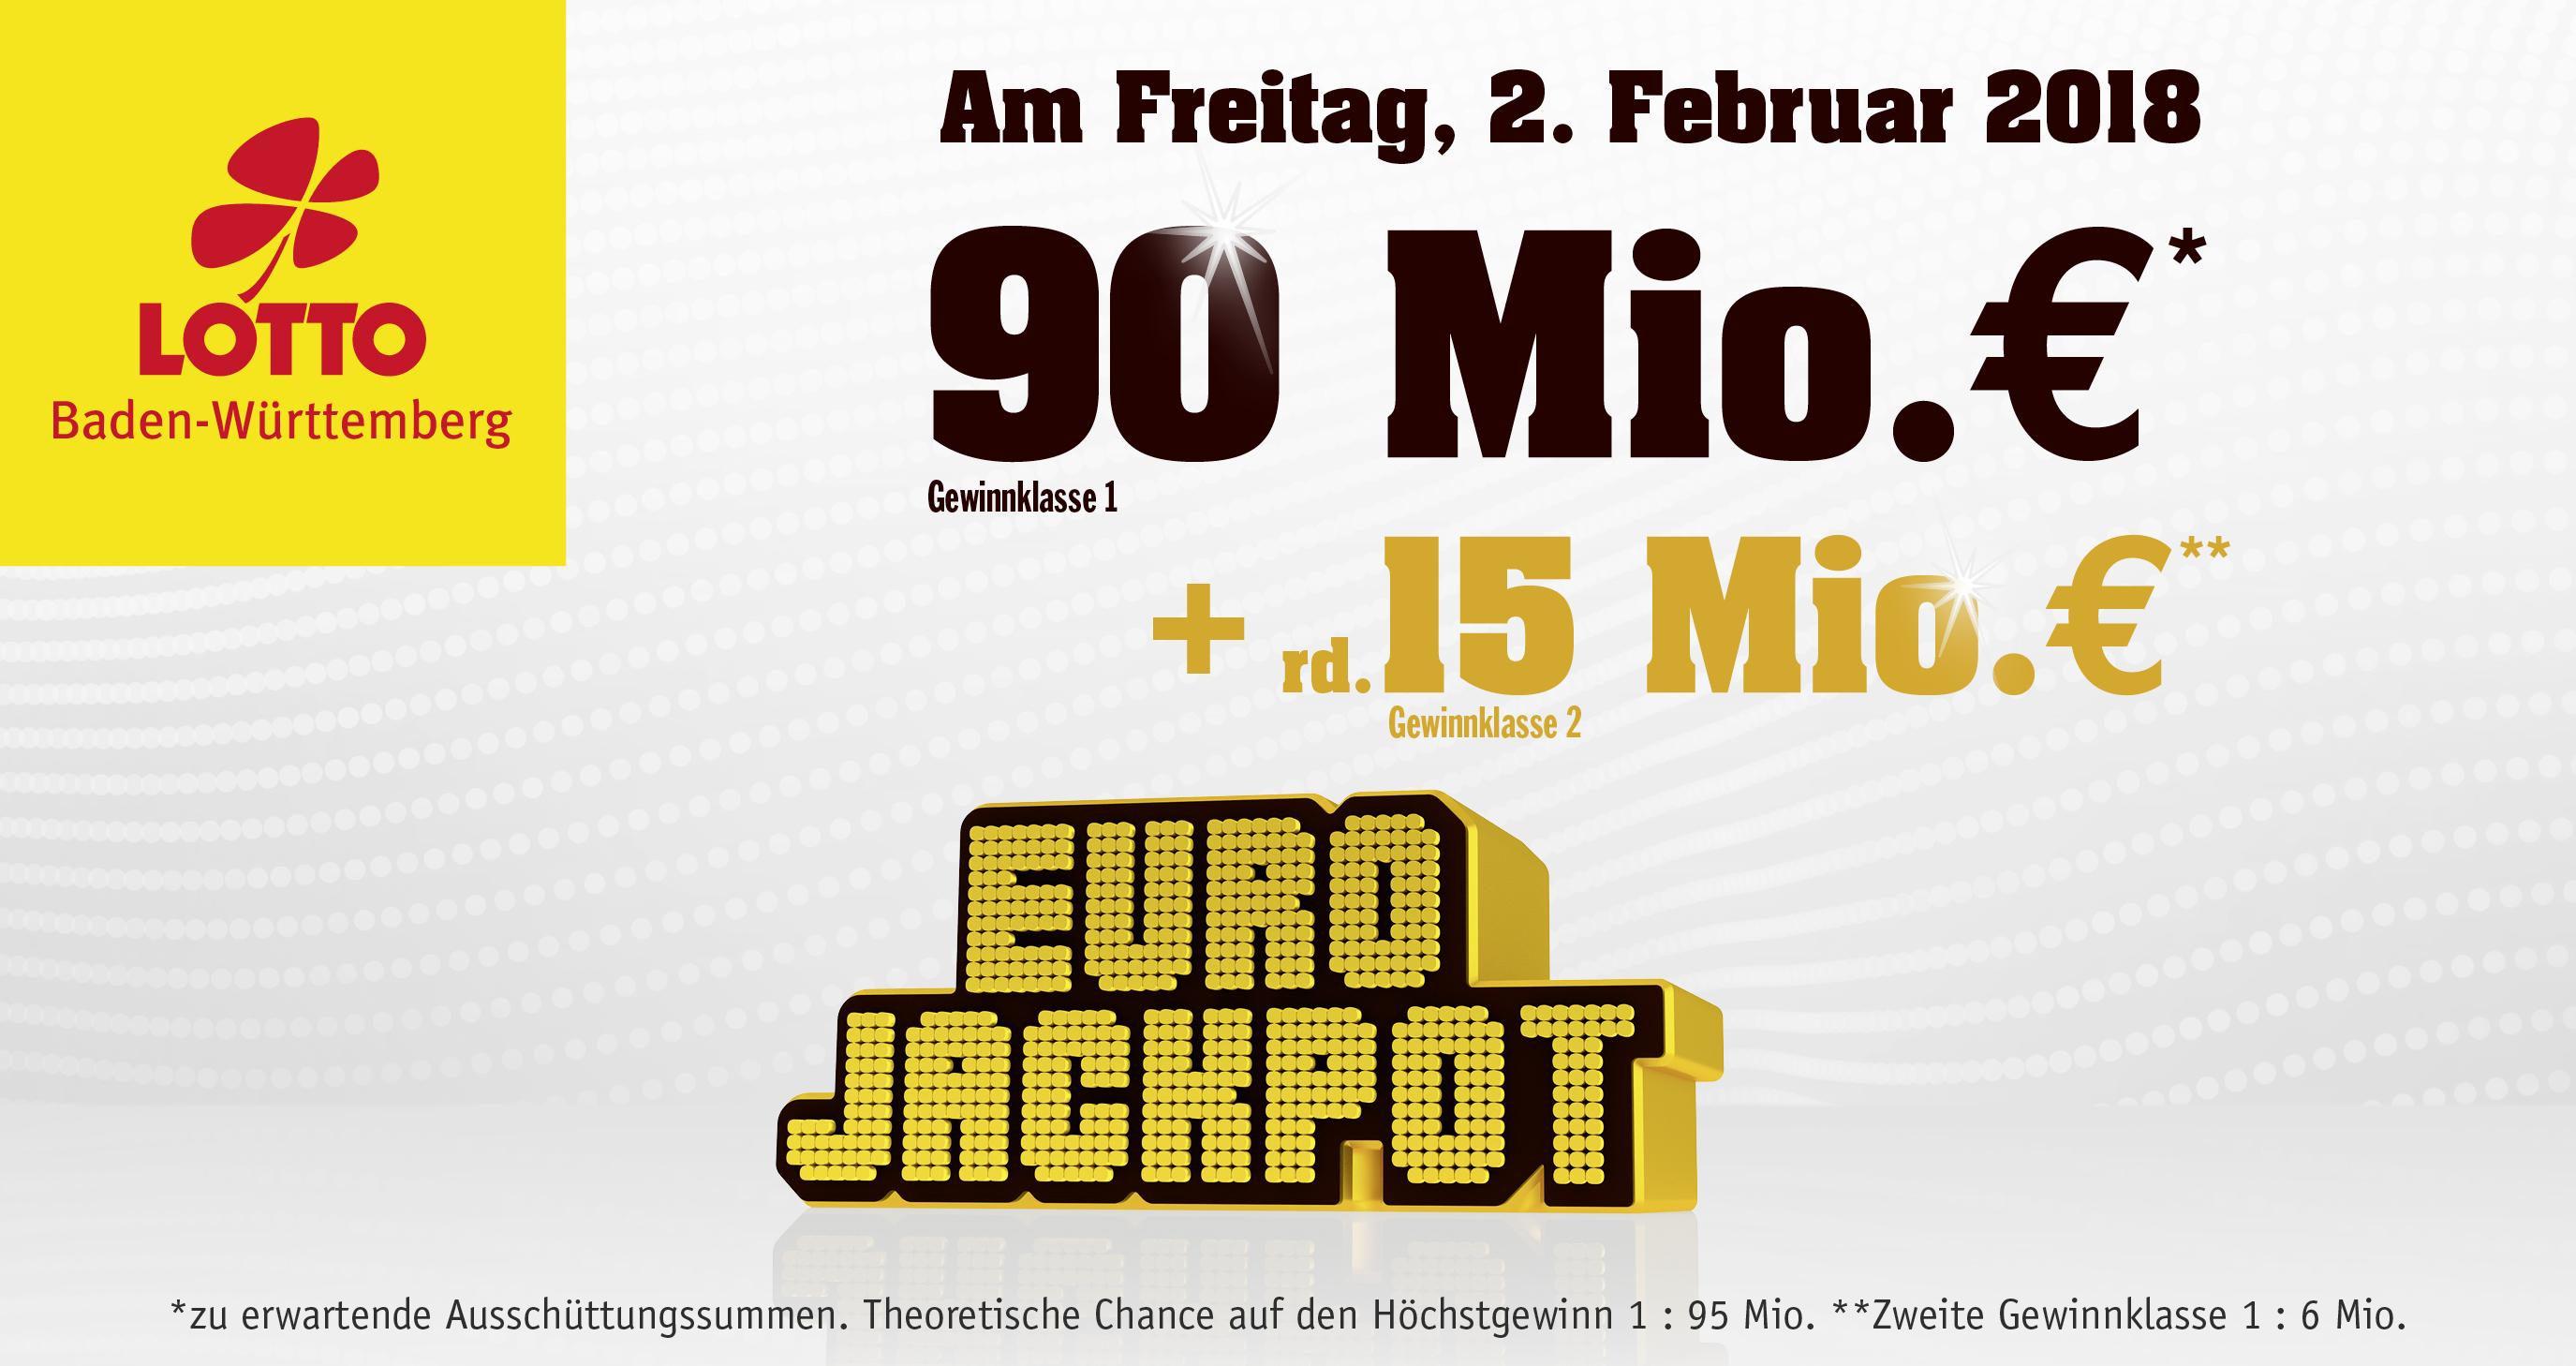 Eurojackpot Zweite GewinnklaГџe